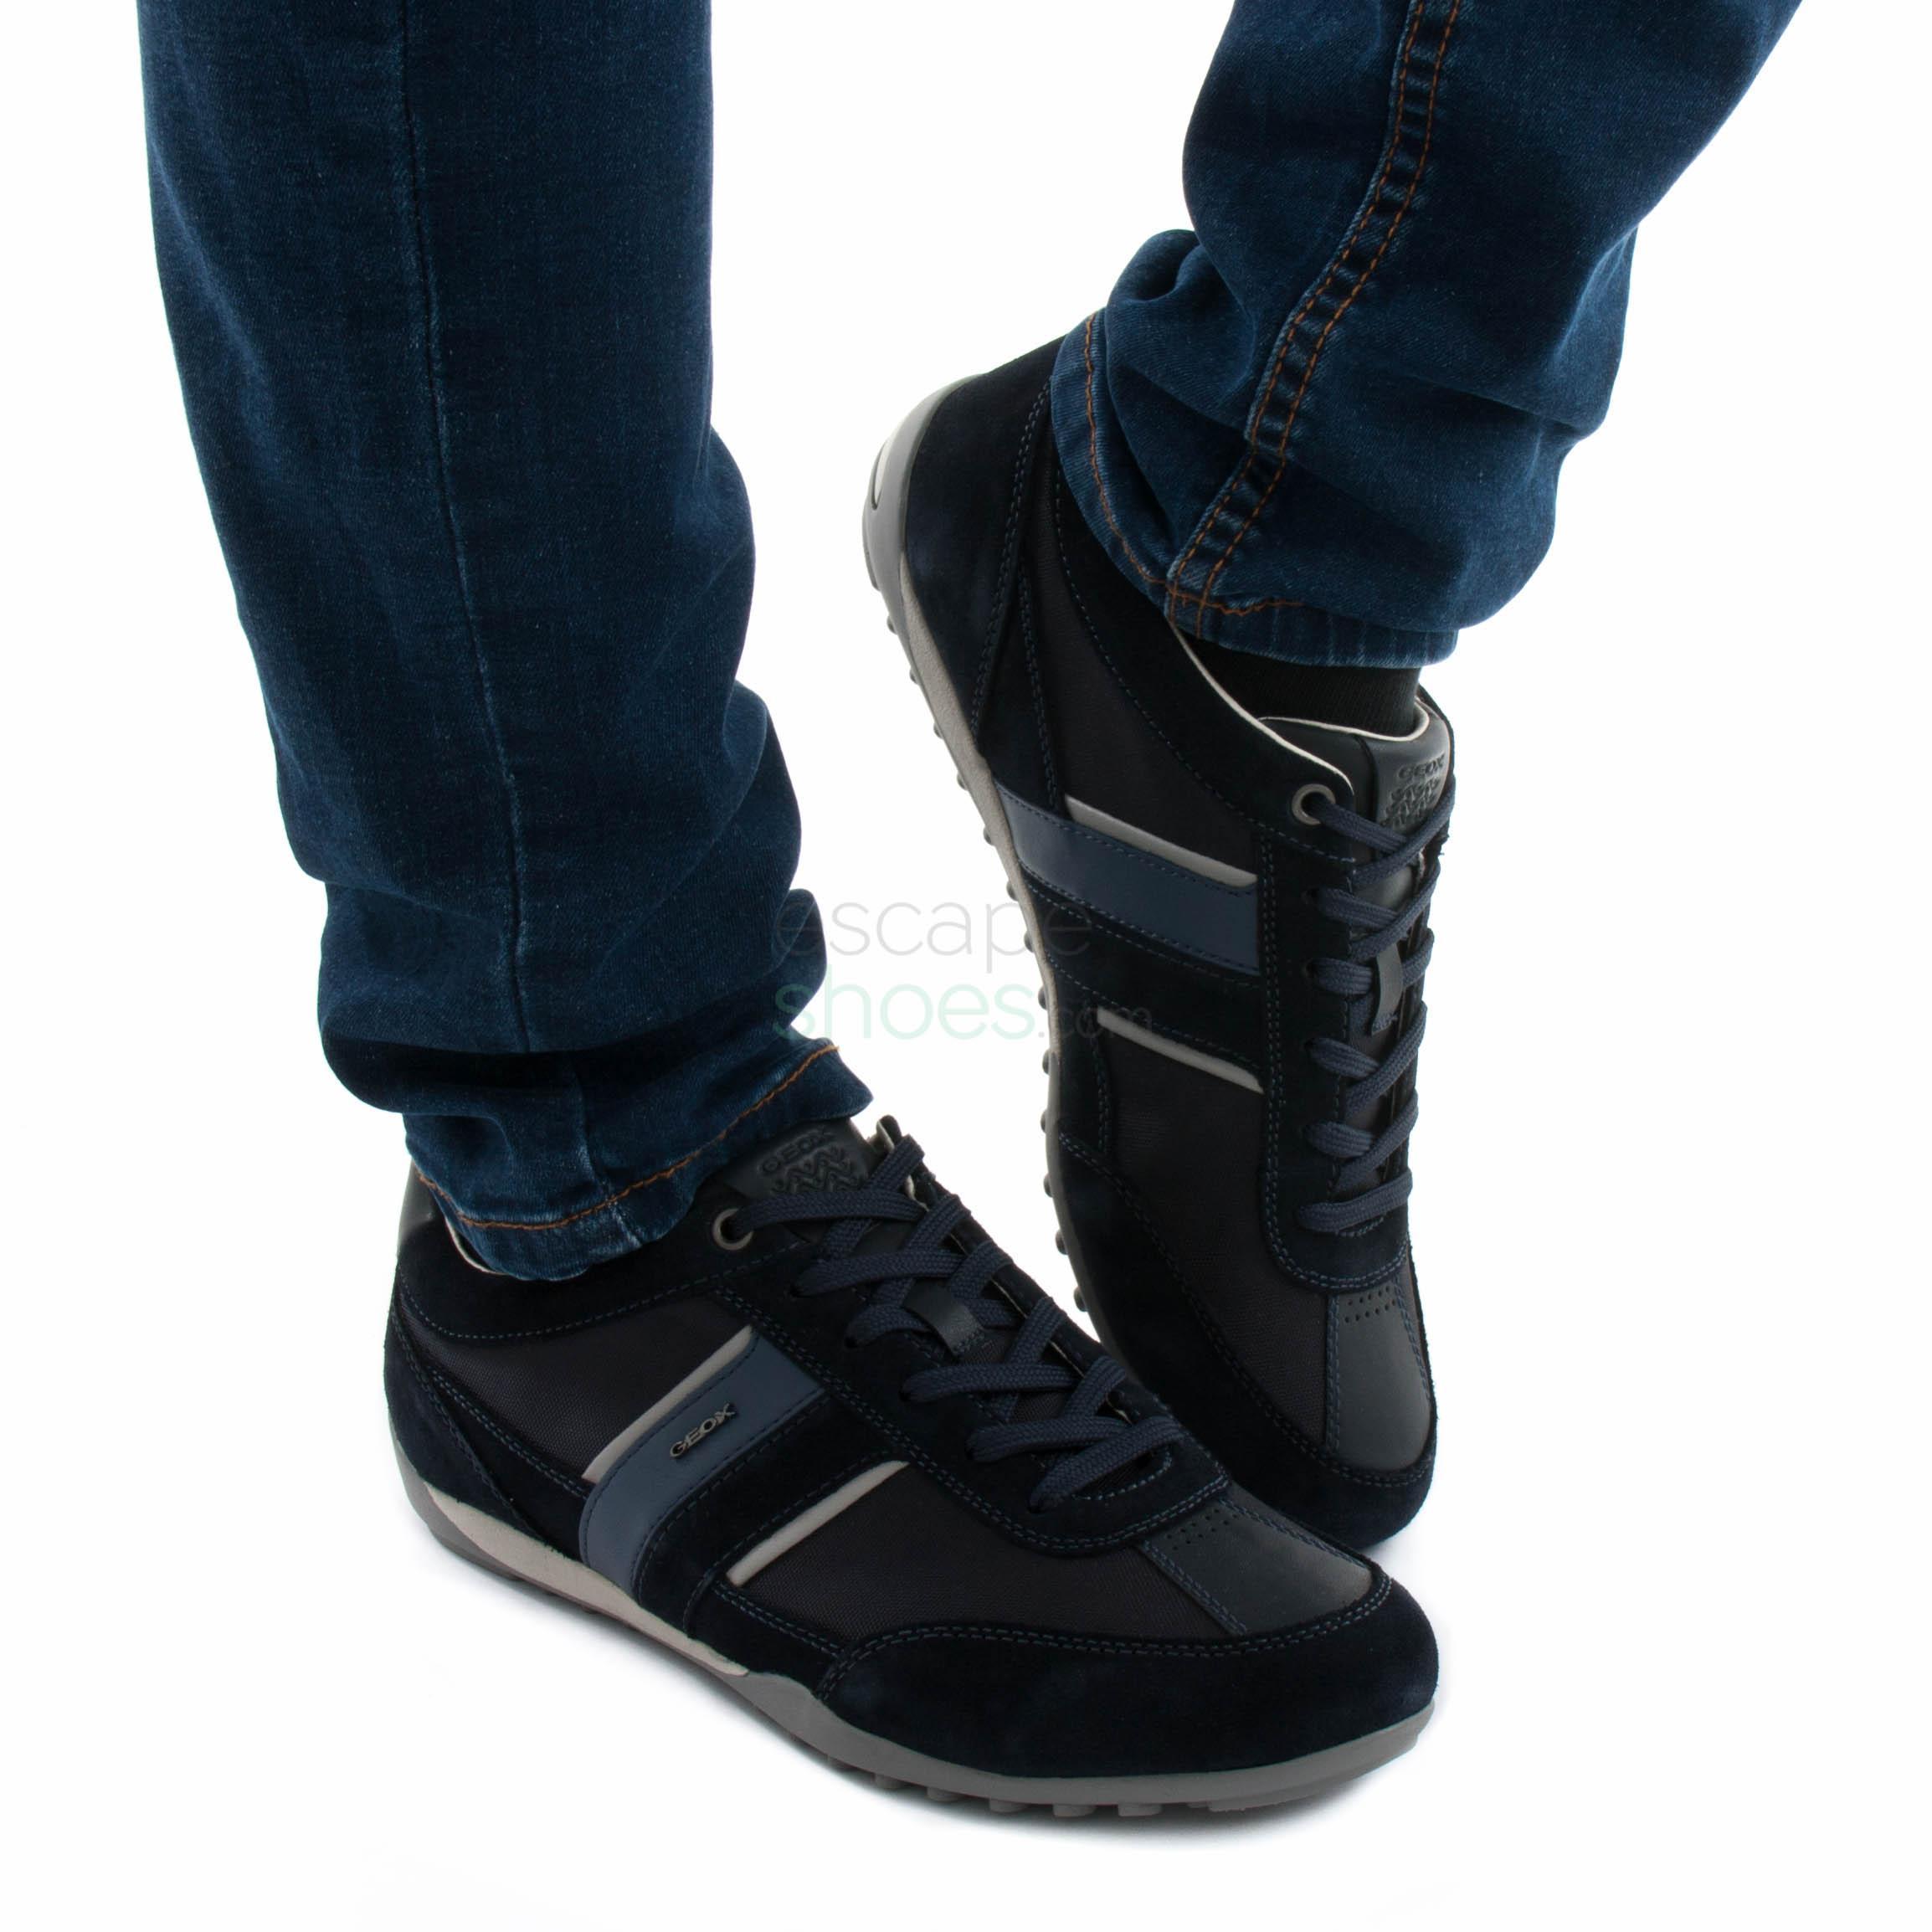 zapatos geox azul marino oscuro